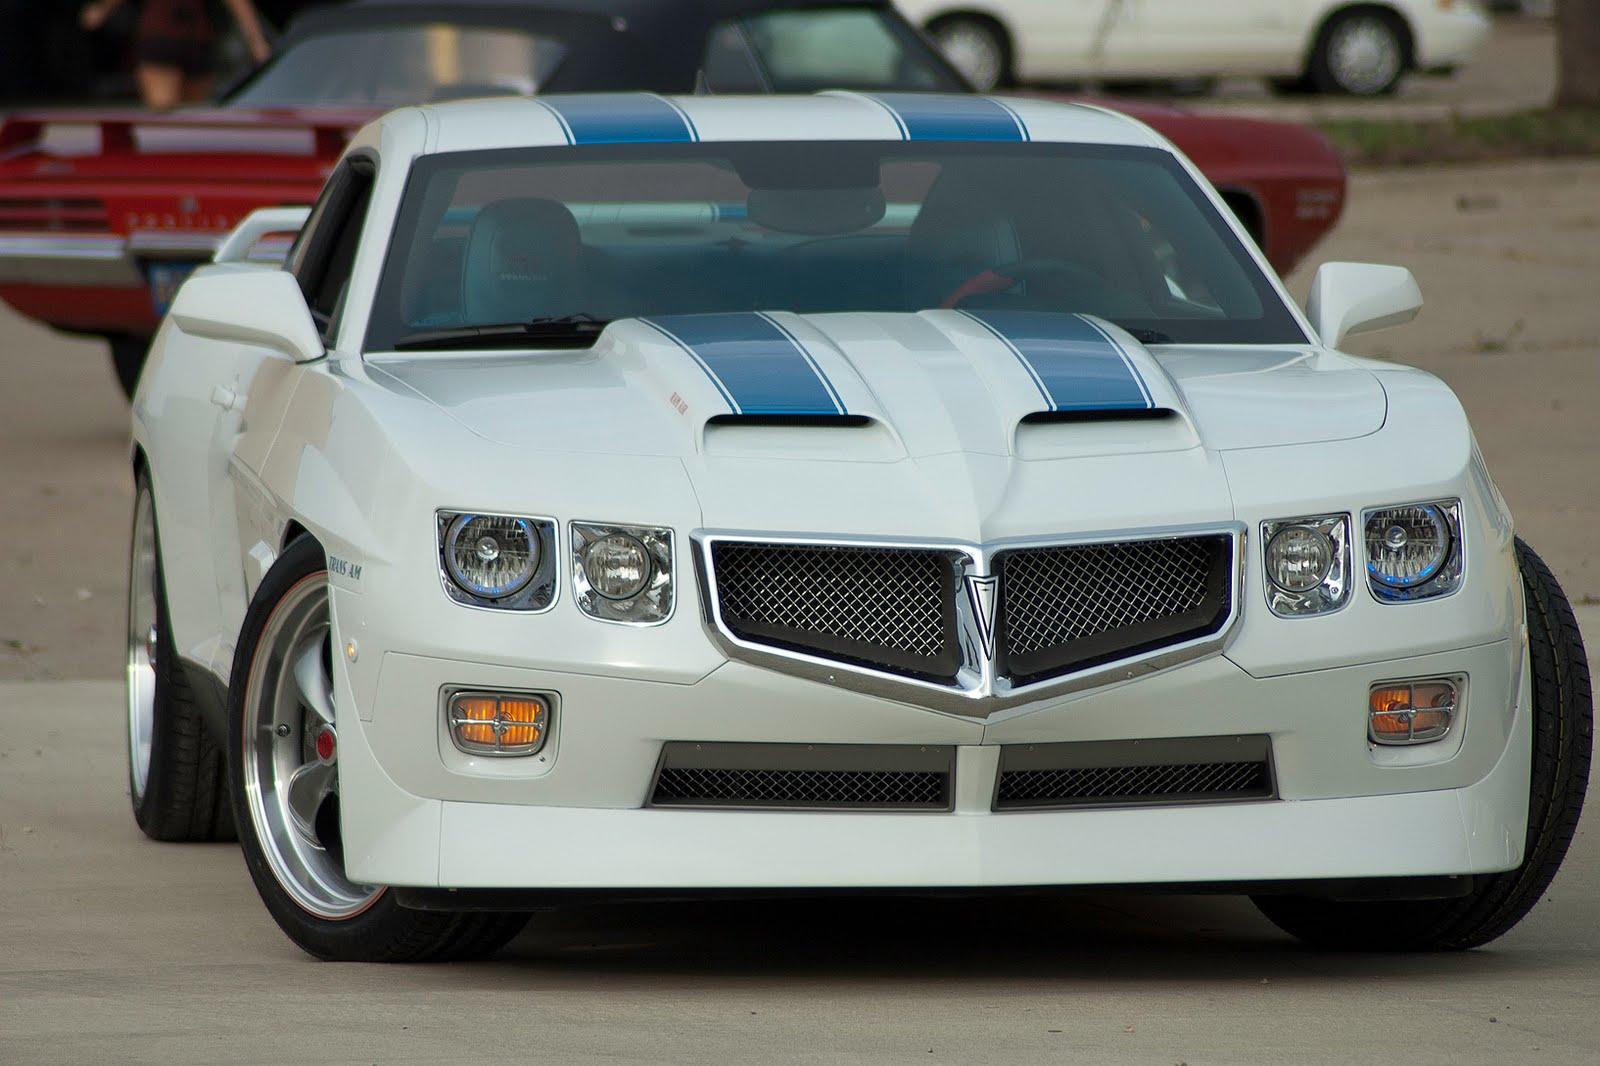 2014 Pontiac Trans Am For Sale